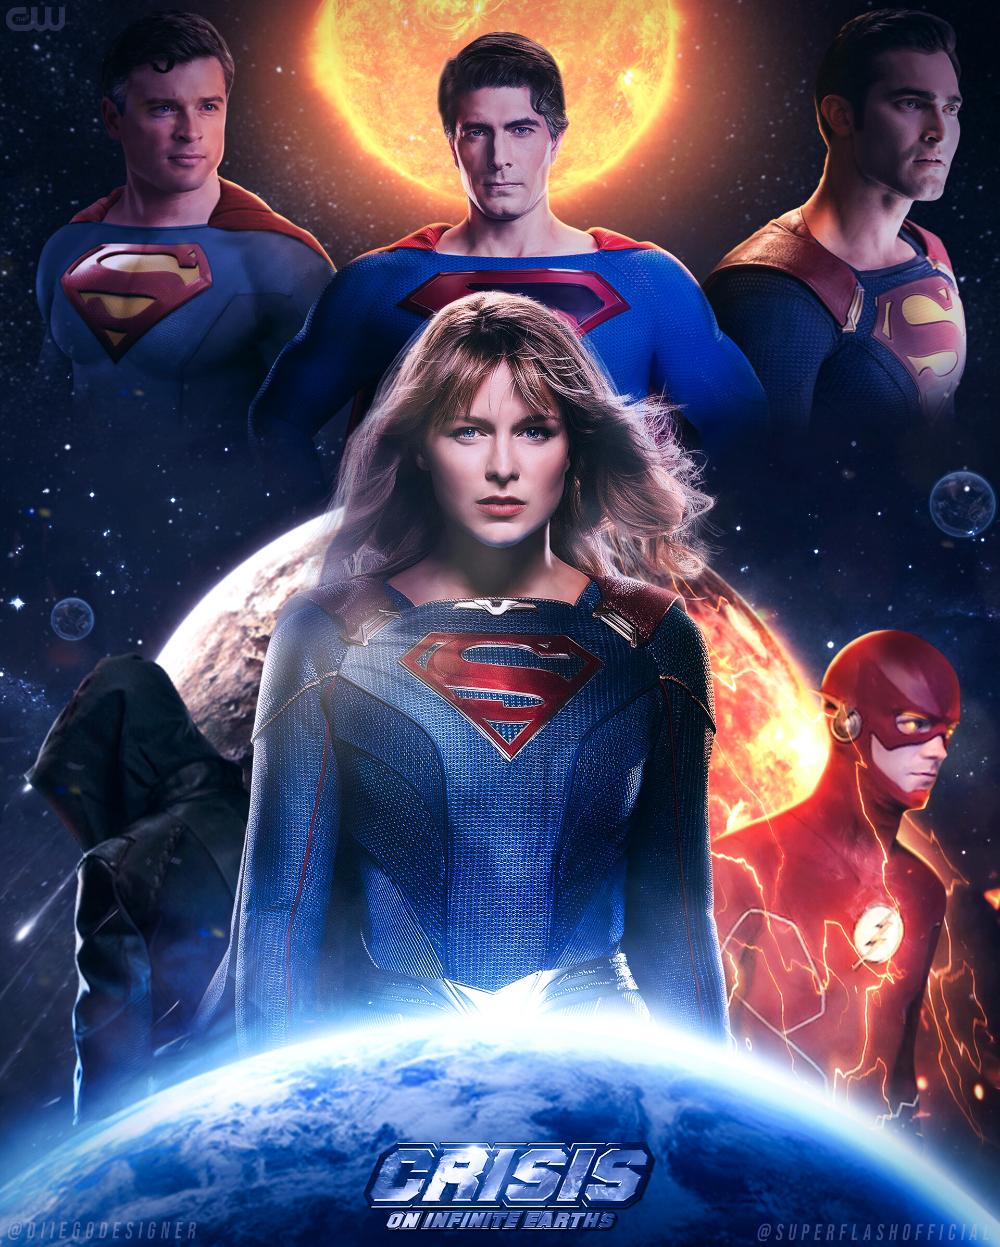 Artstation Crisis On Infinite Earths Poster Diiego Designer